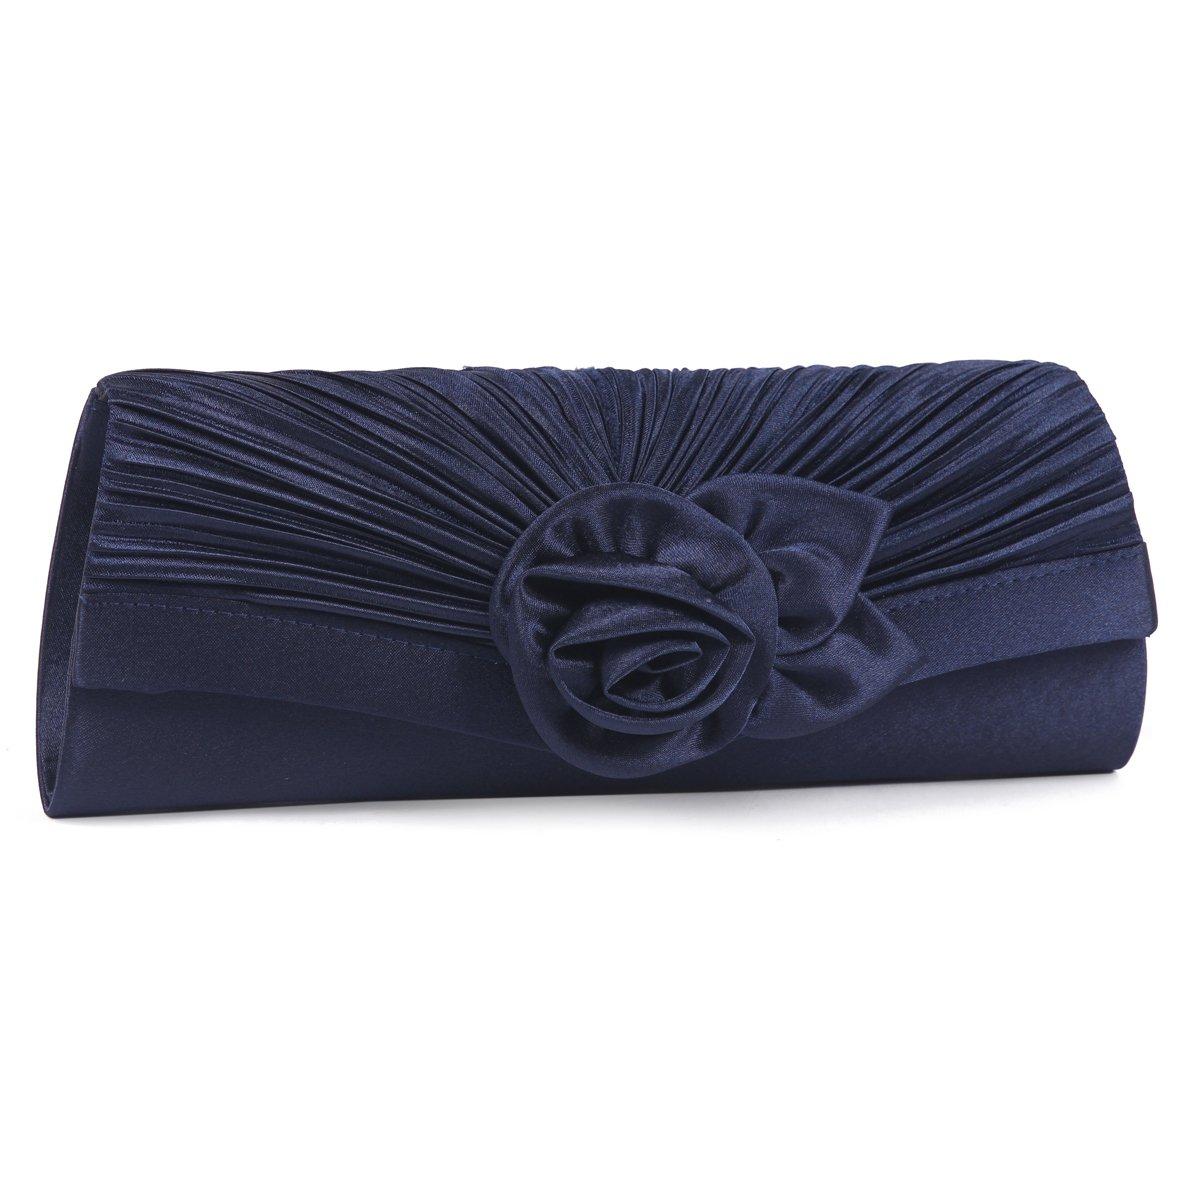 Damara Women's Satin Pleated Flower Front Evening Bag Clutch Handbag,Navy Blue